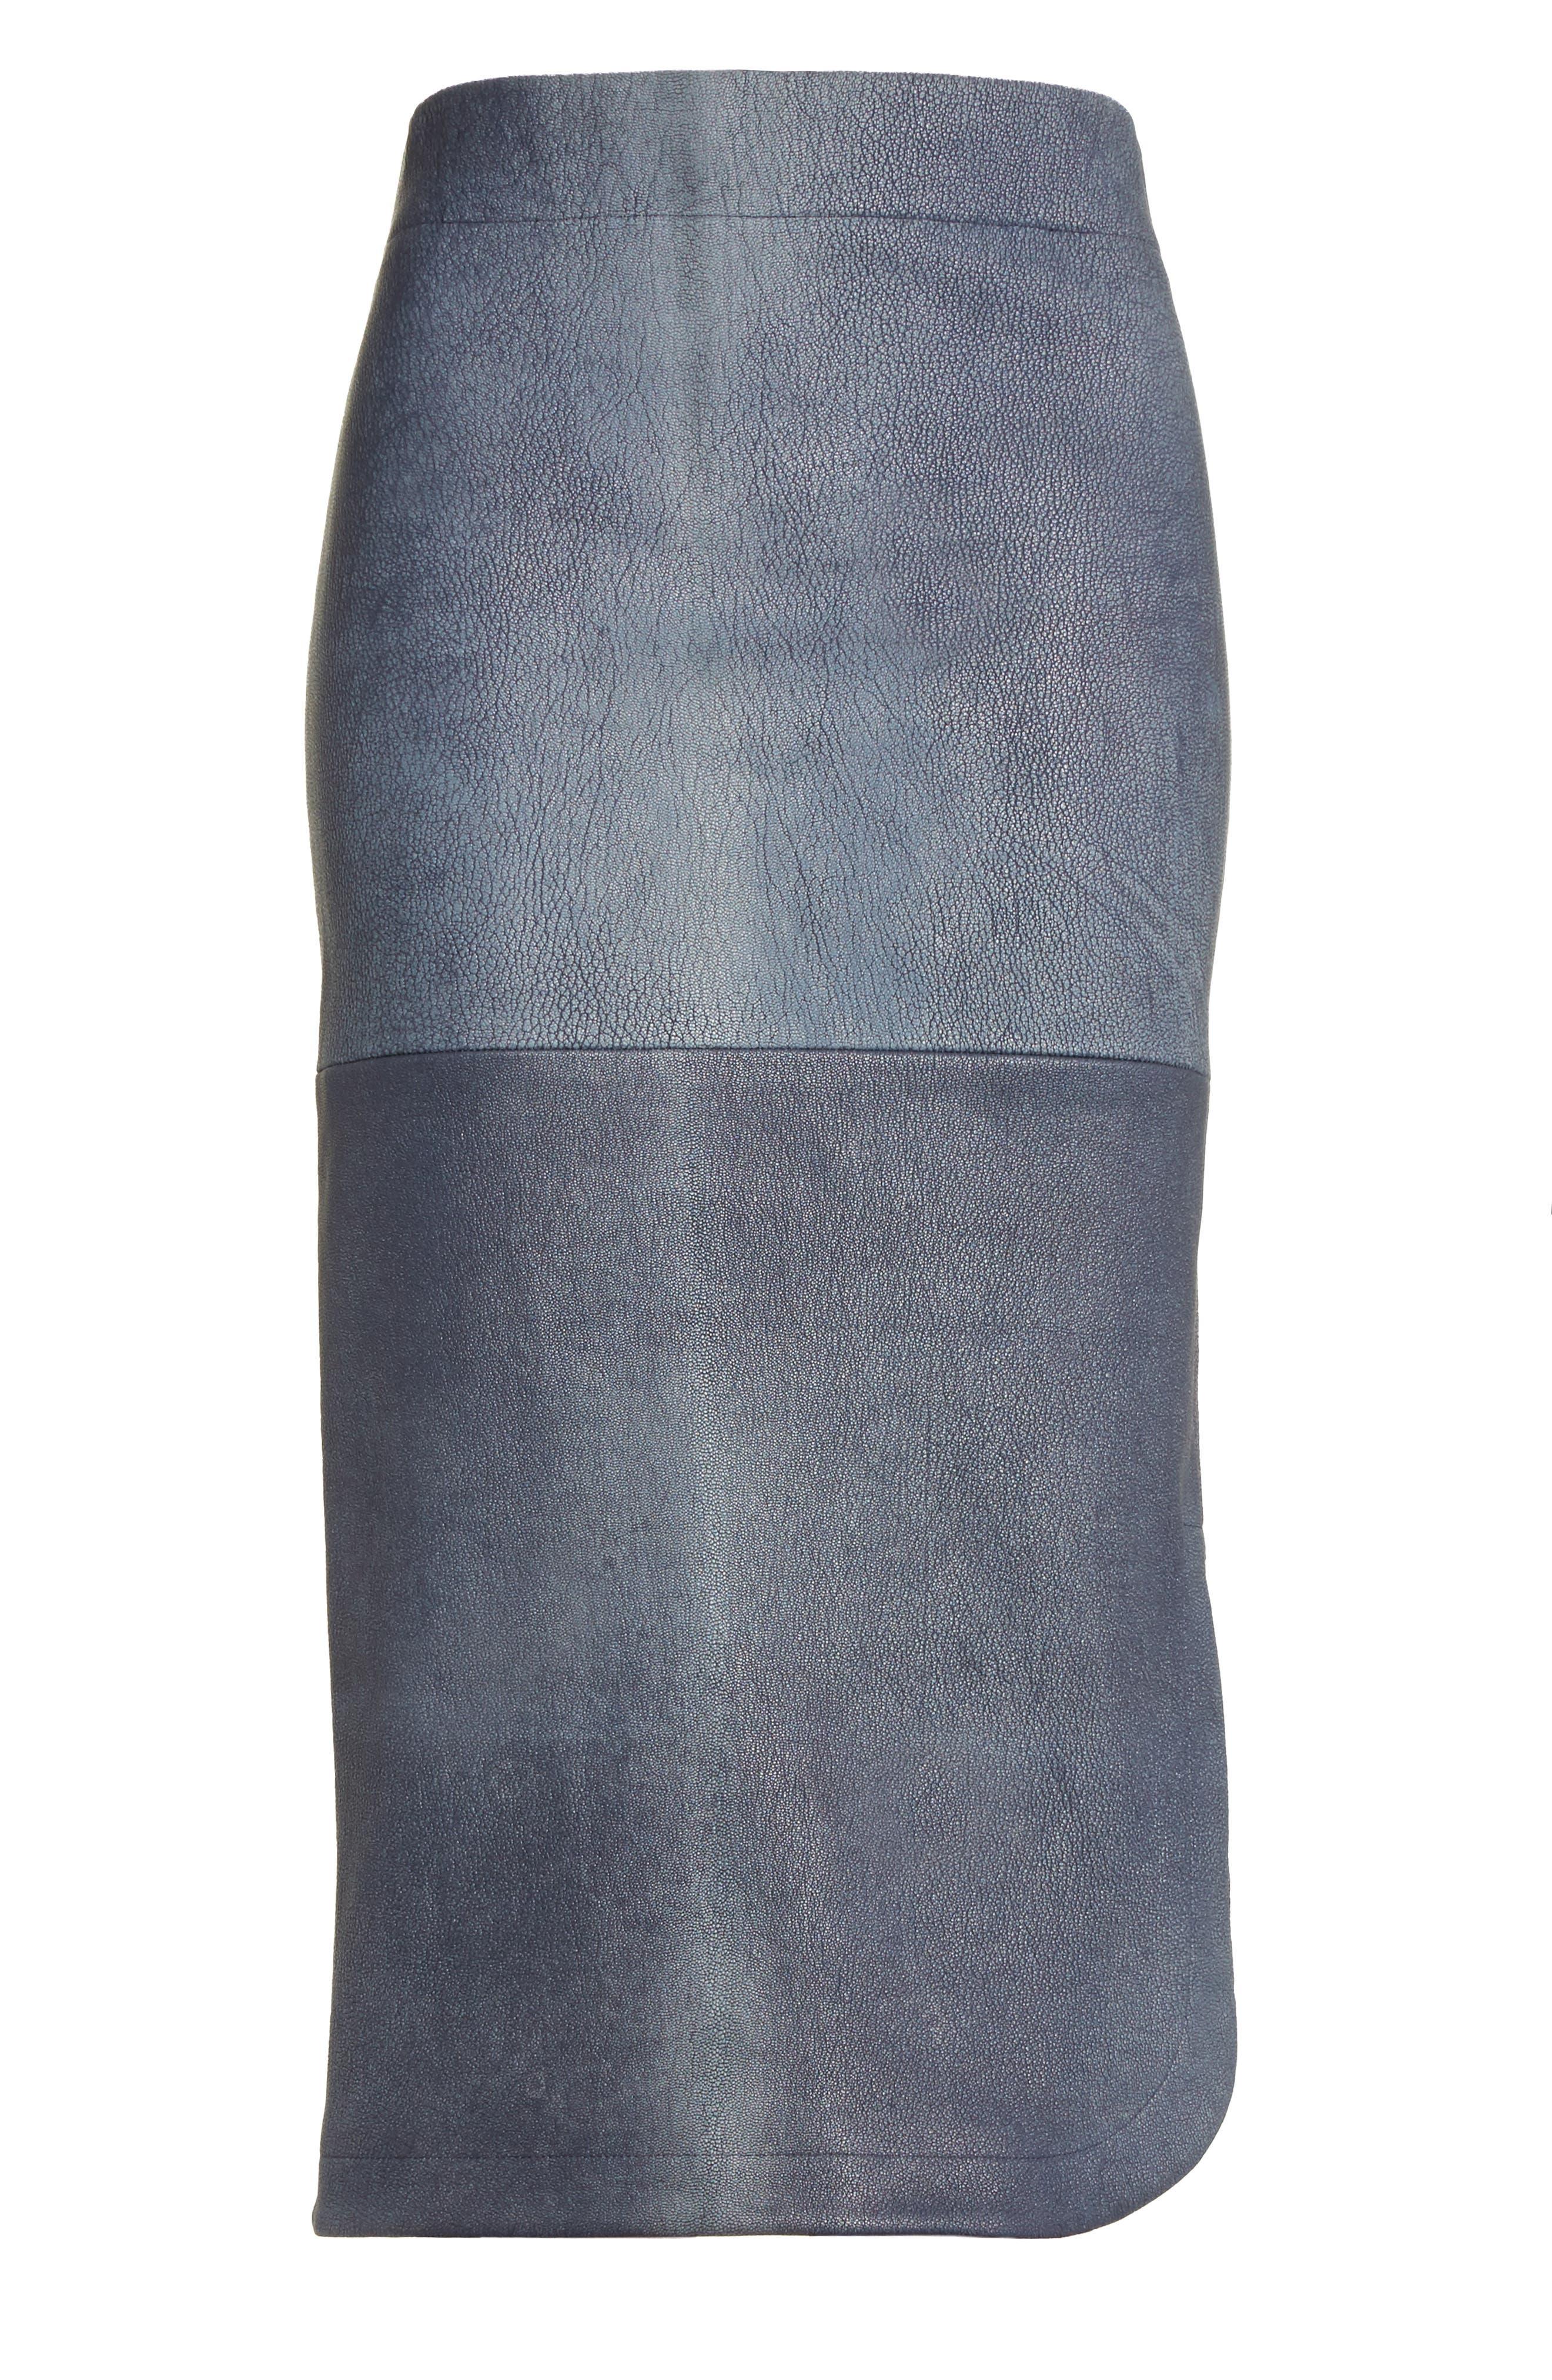 Alternate Image 4  - Zero + Maria Cornejo Rai Leather Curved Skirt